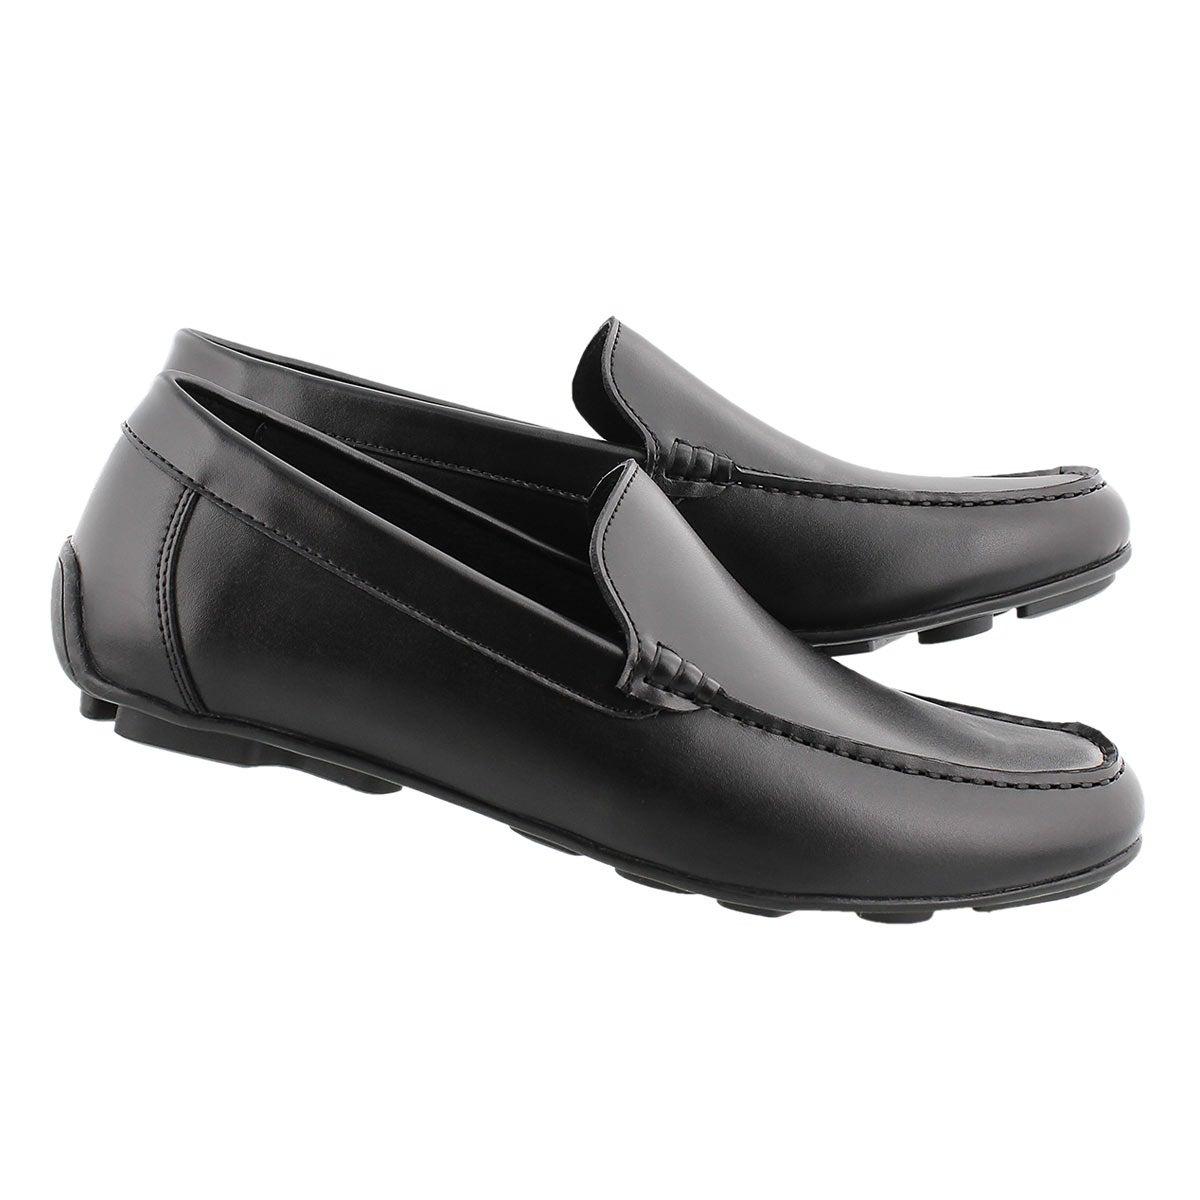 Mns Josh black slip on dress loafer